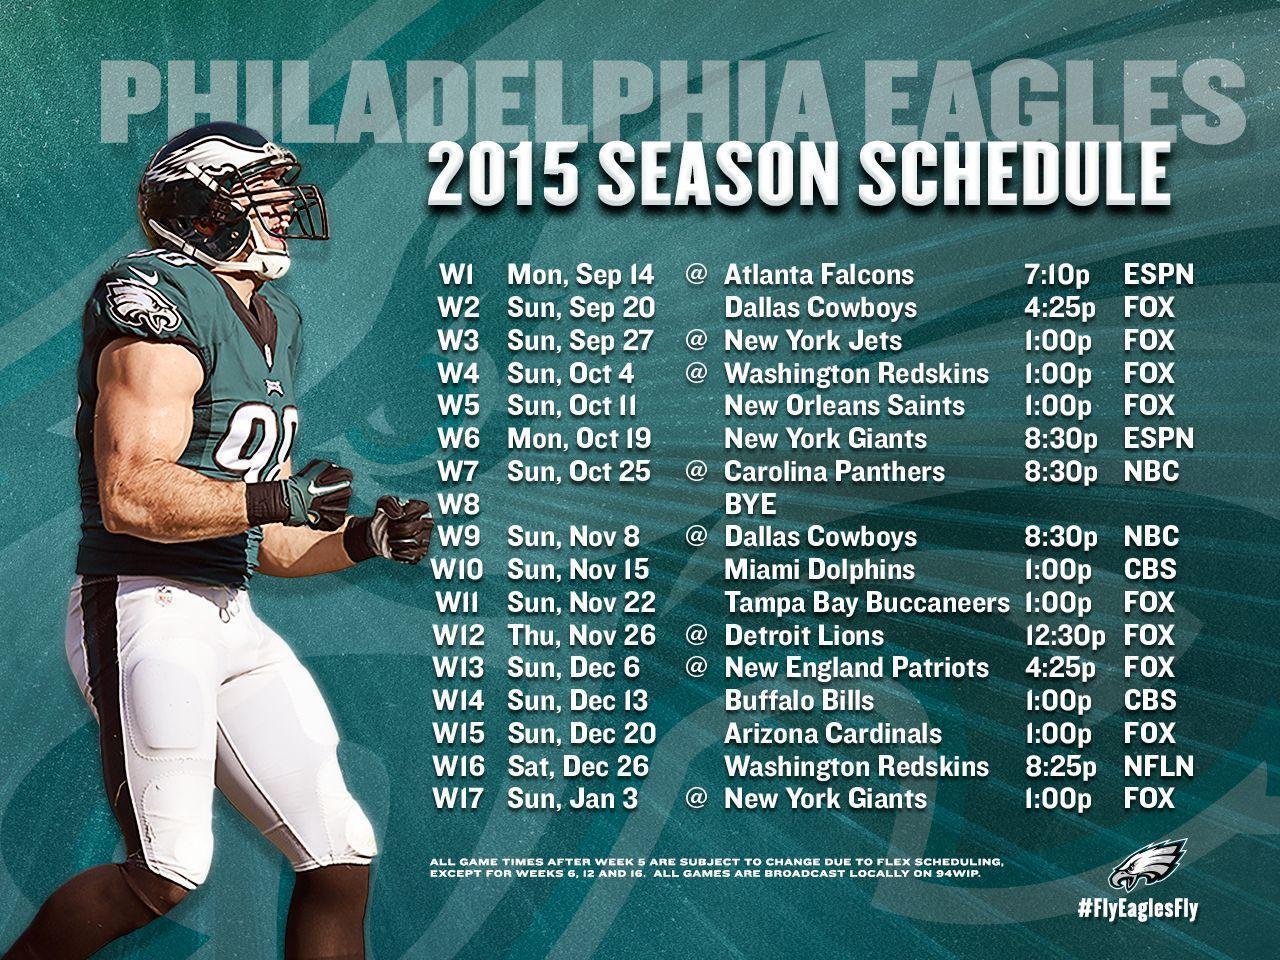 Philadelphia Eagles 2017 Schedule Wallpapers - Wallpaper Cave